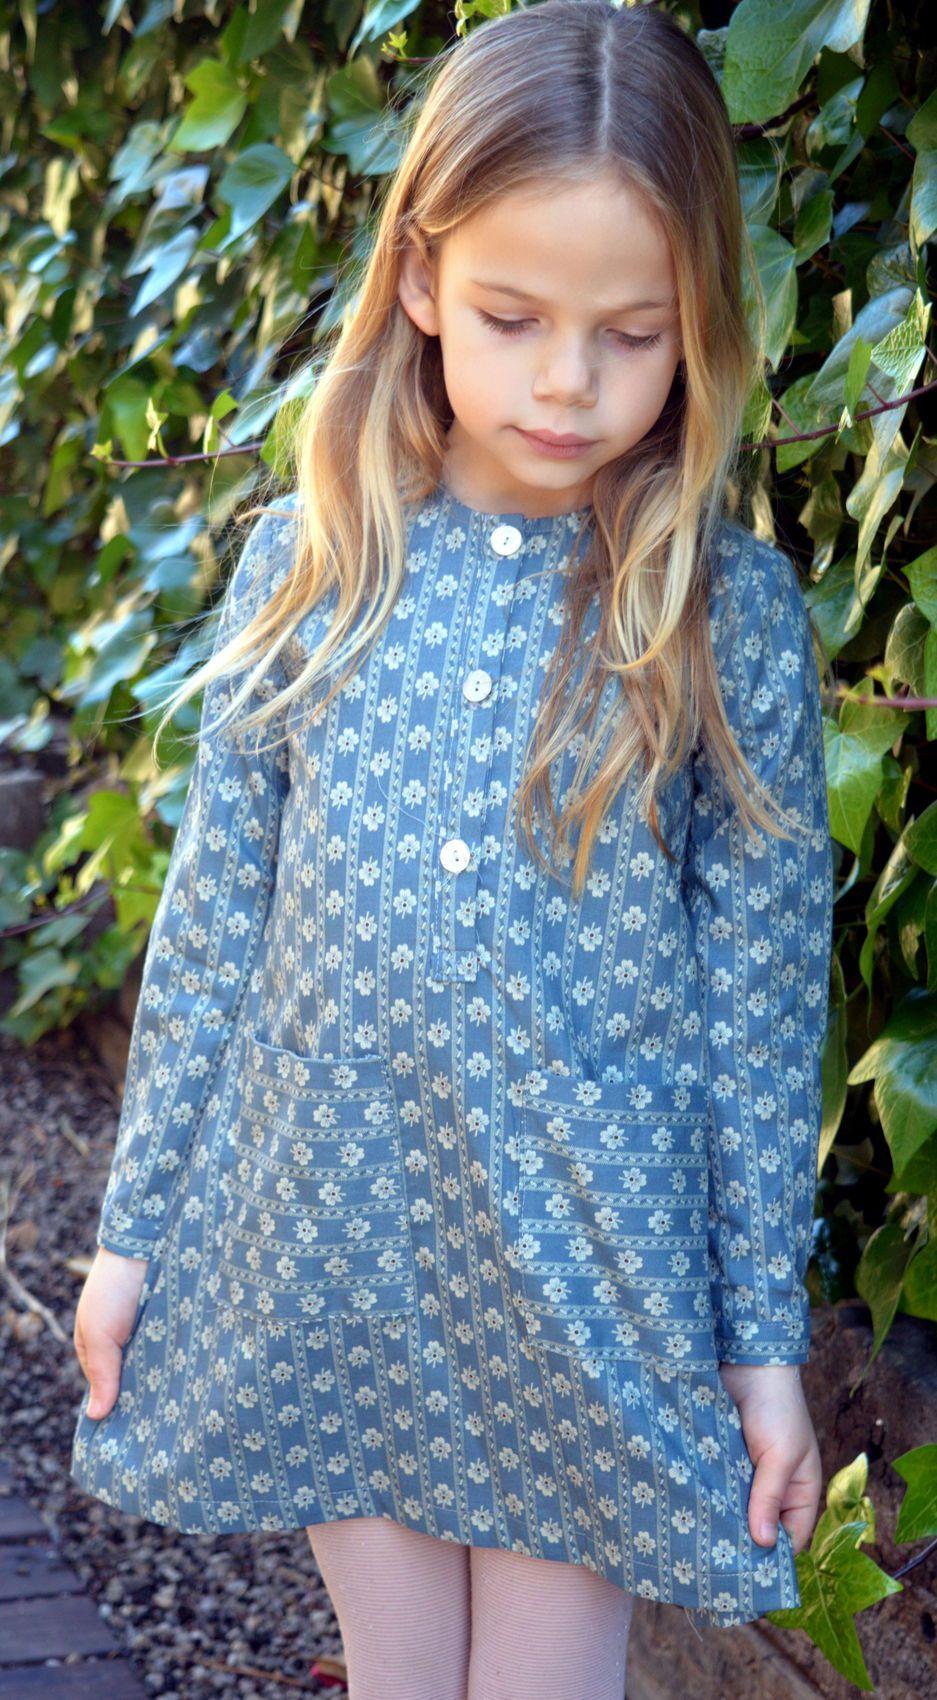 moodblue blog de moda infantil y juvenil 12